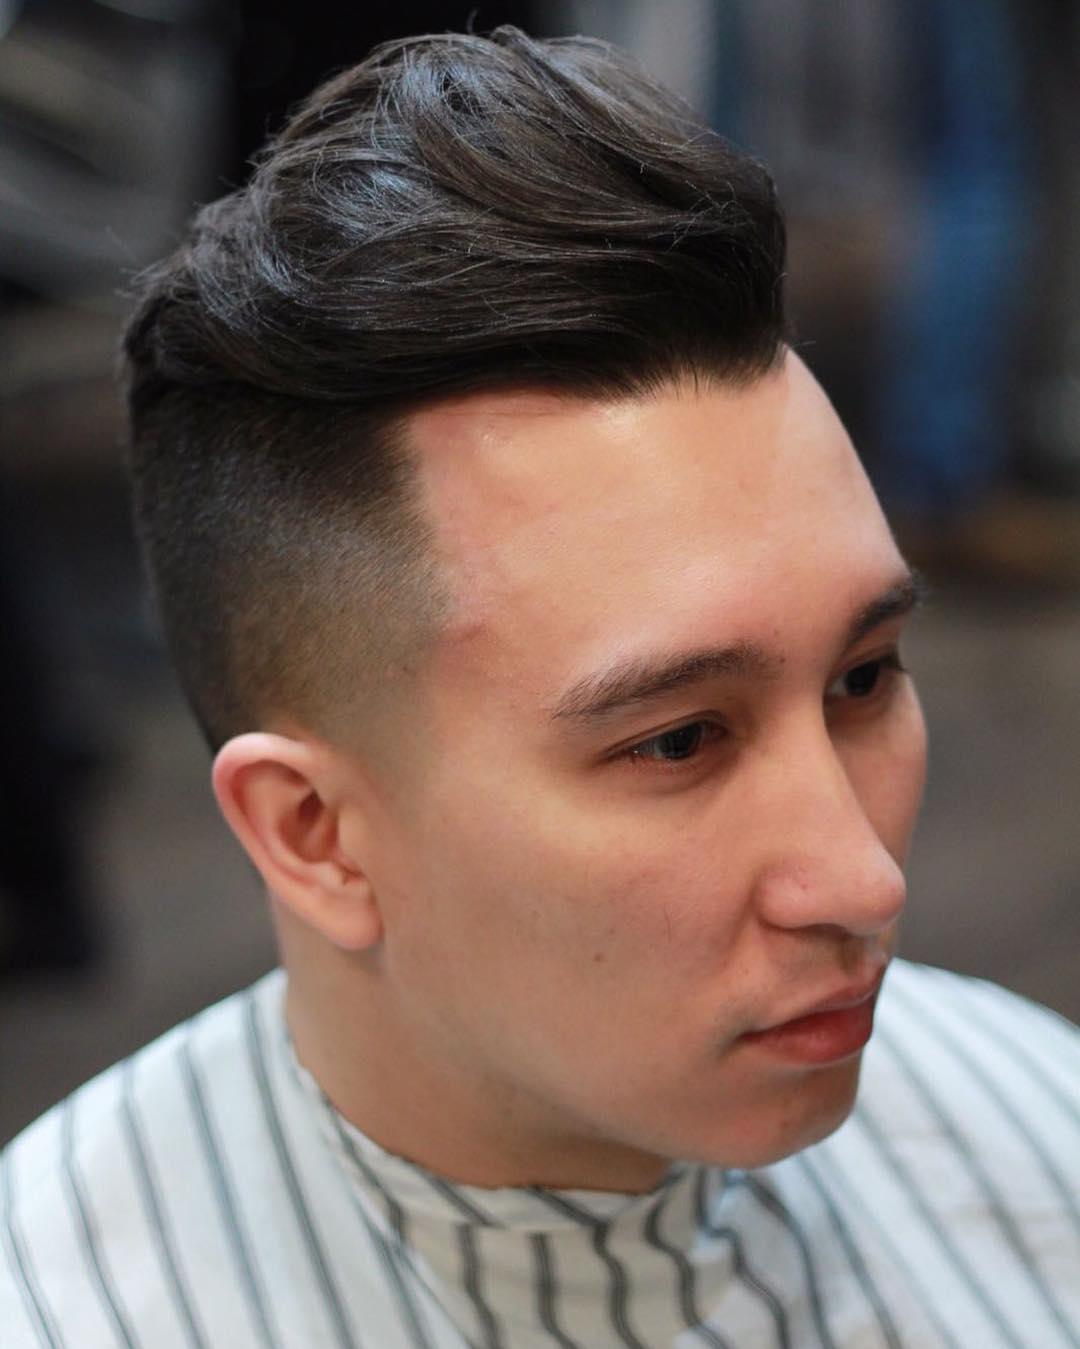 Medium length textured pompadour haircut